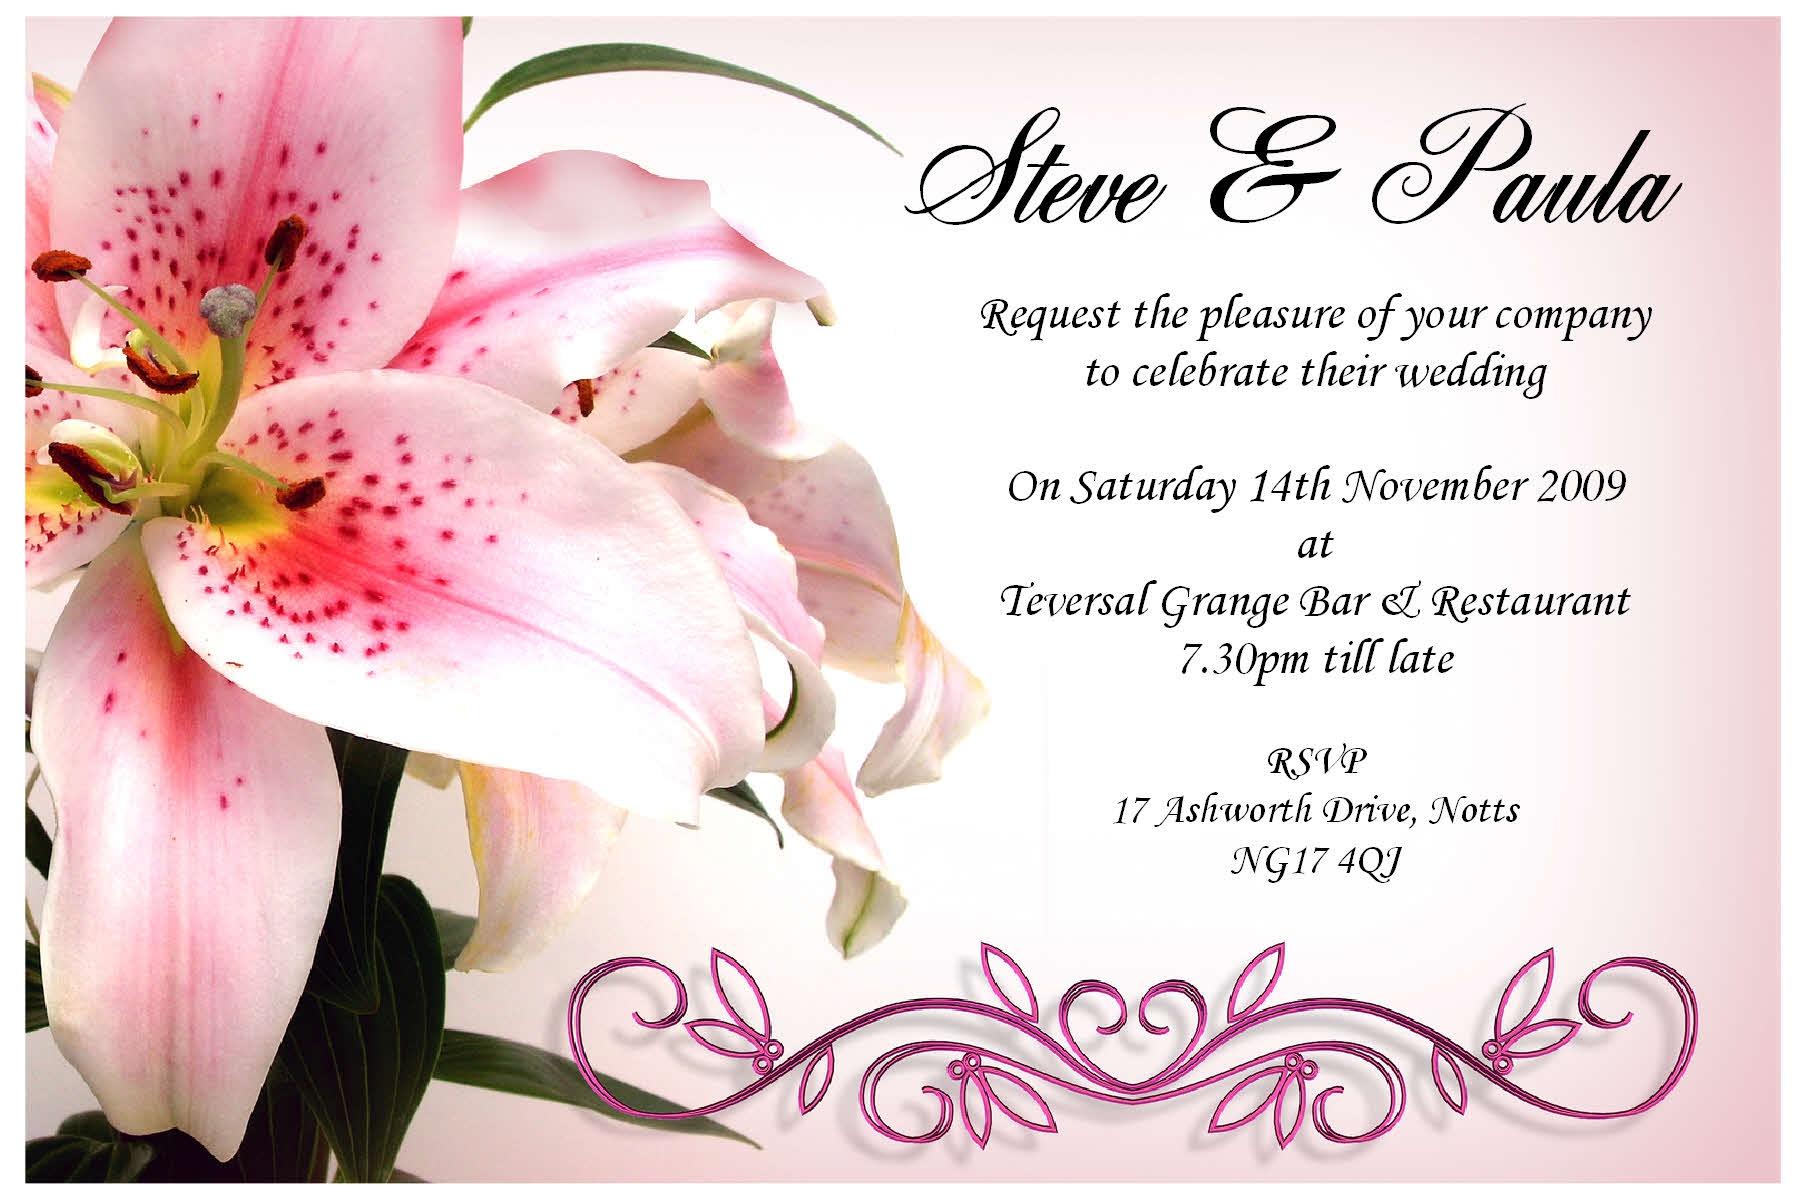 lovable-design-invitation-card-for-wedding-invitation-cards-for-wedding-plumegiant